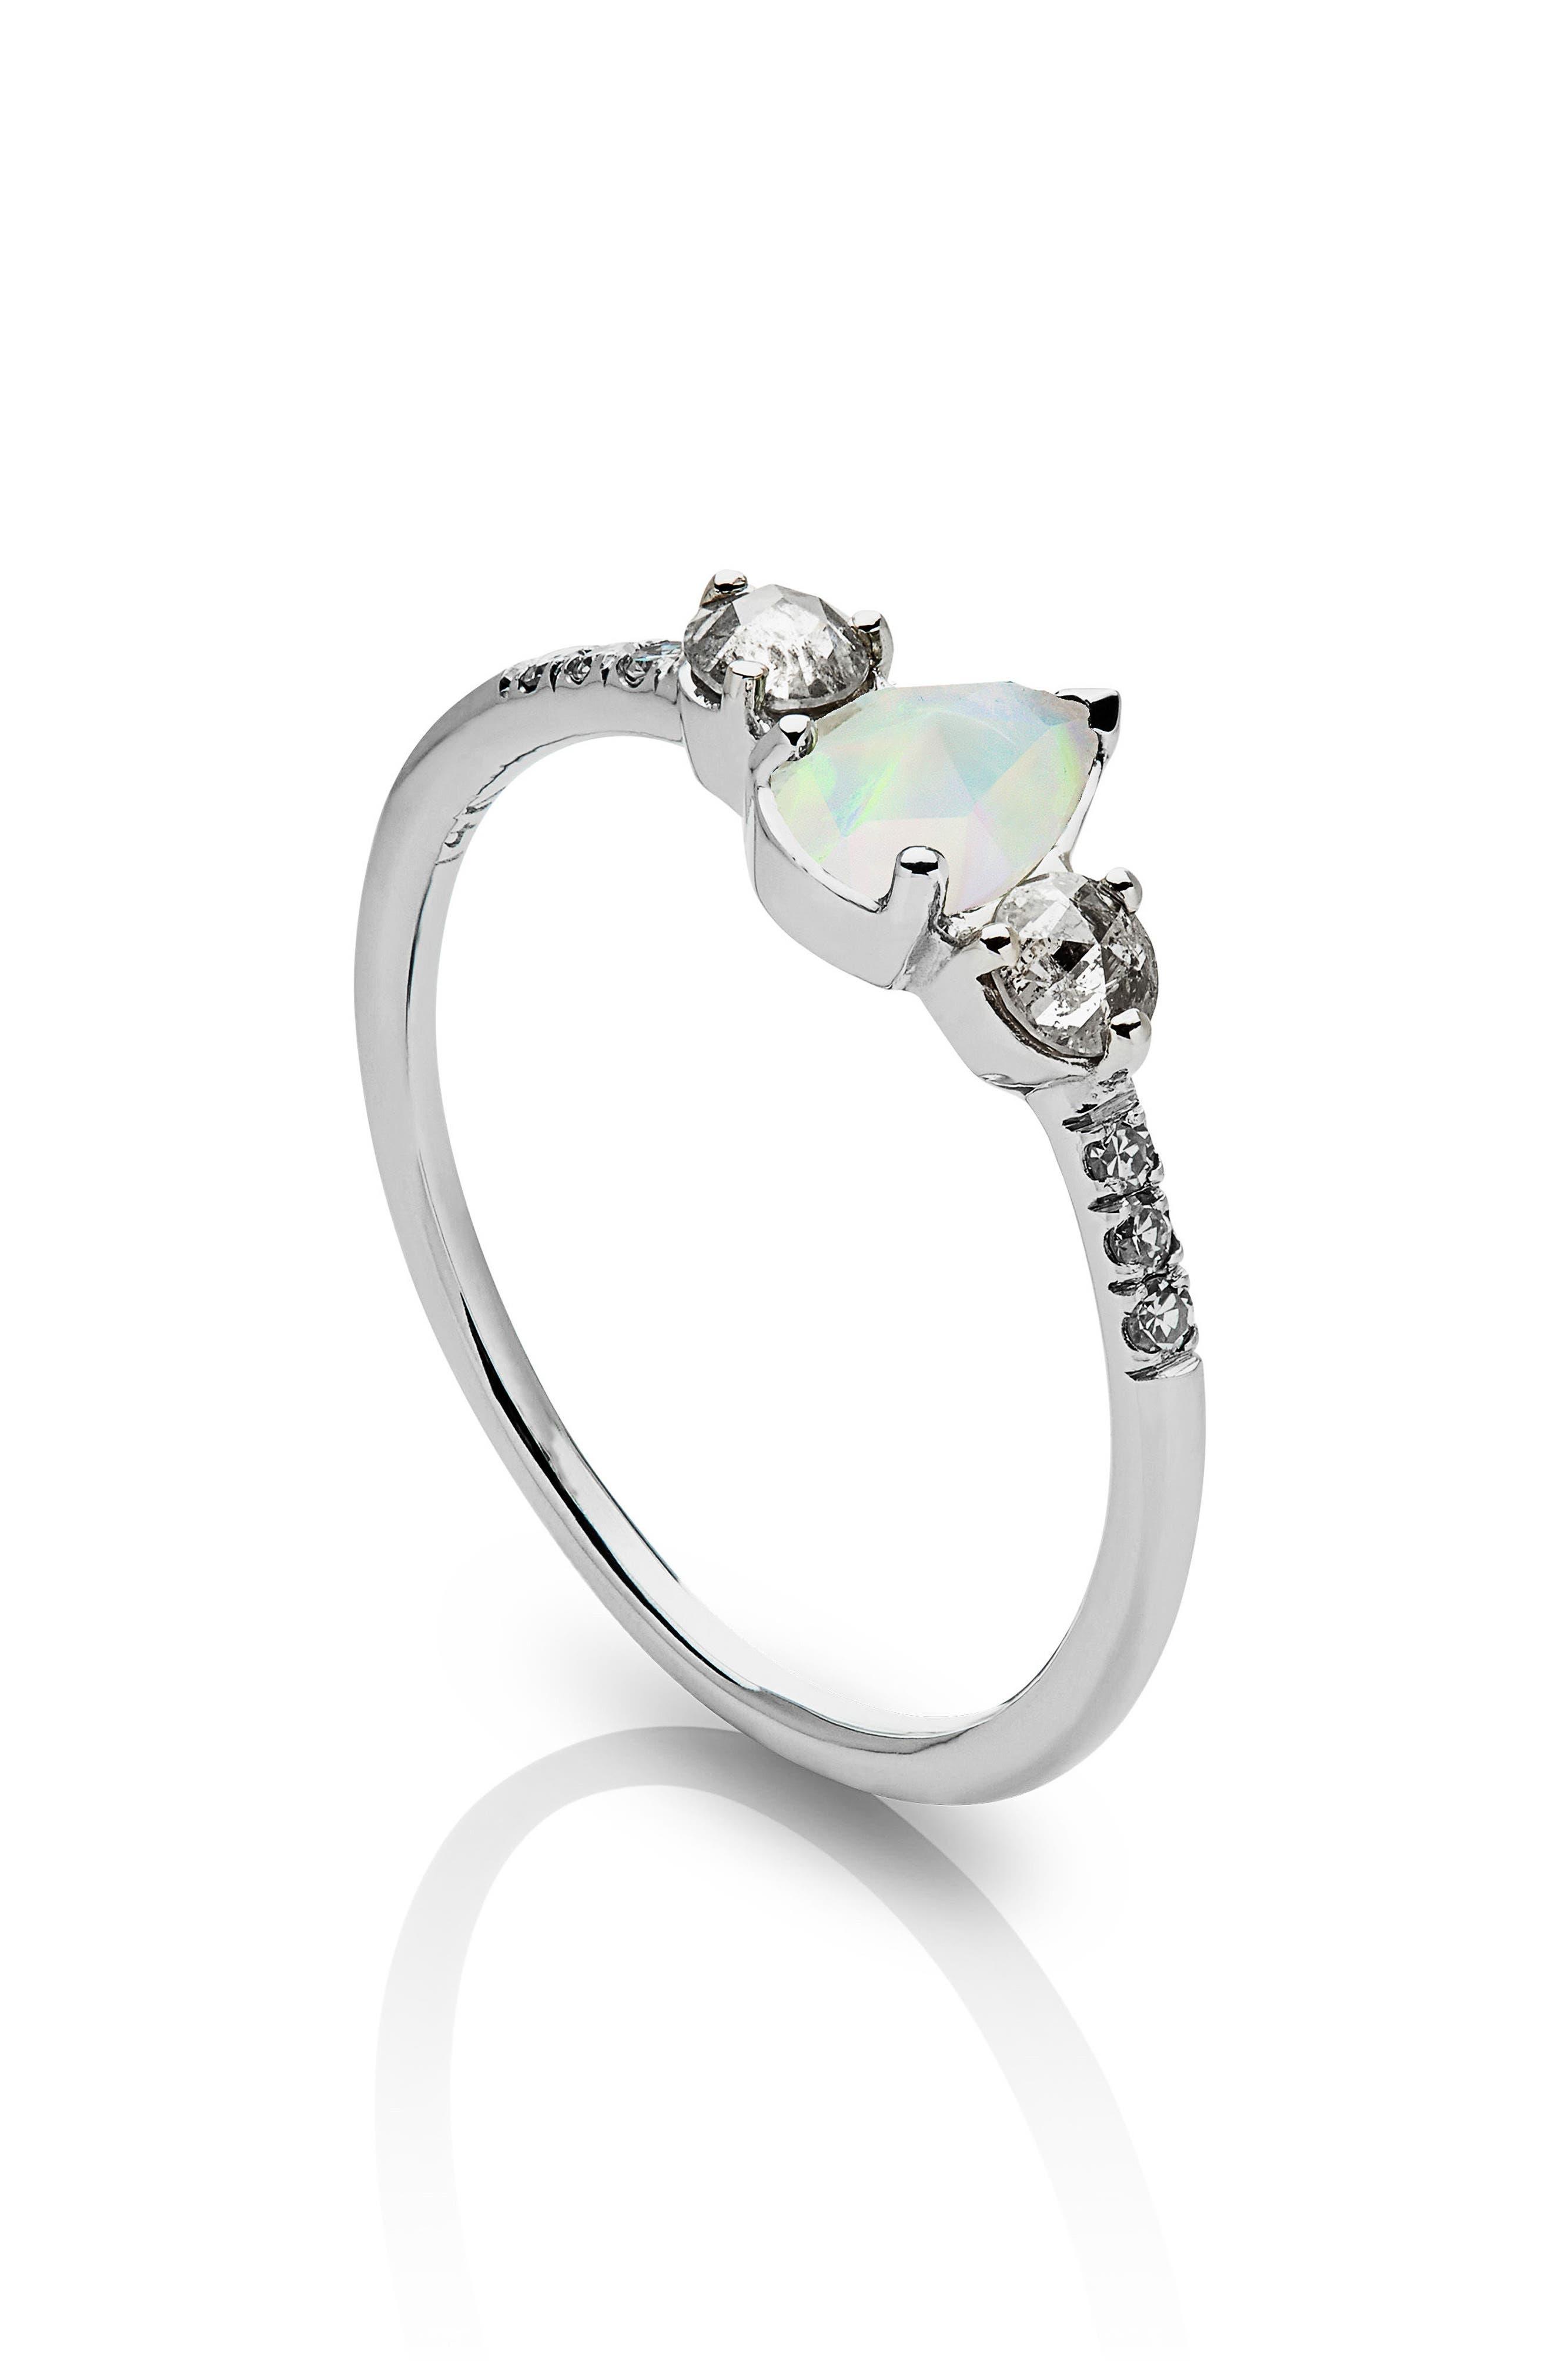 Radiance Opal & Diamond Ring,                             Alternate thumbnail 2, color,                             WHITE GOLD/ OPAL